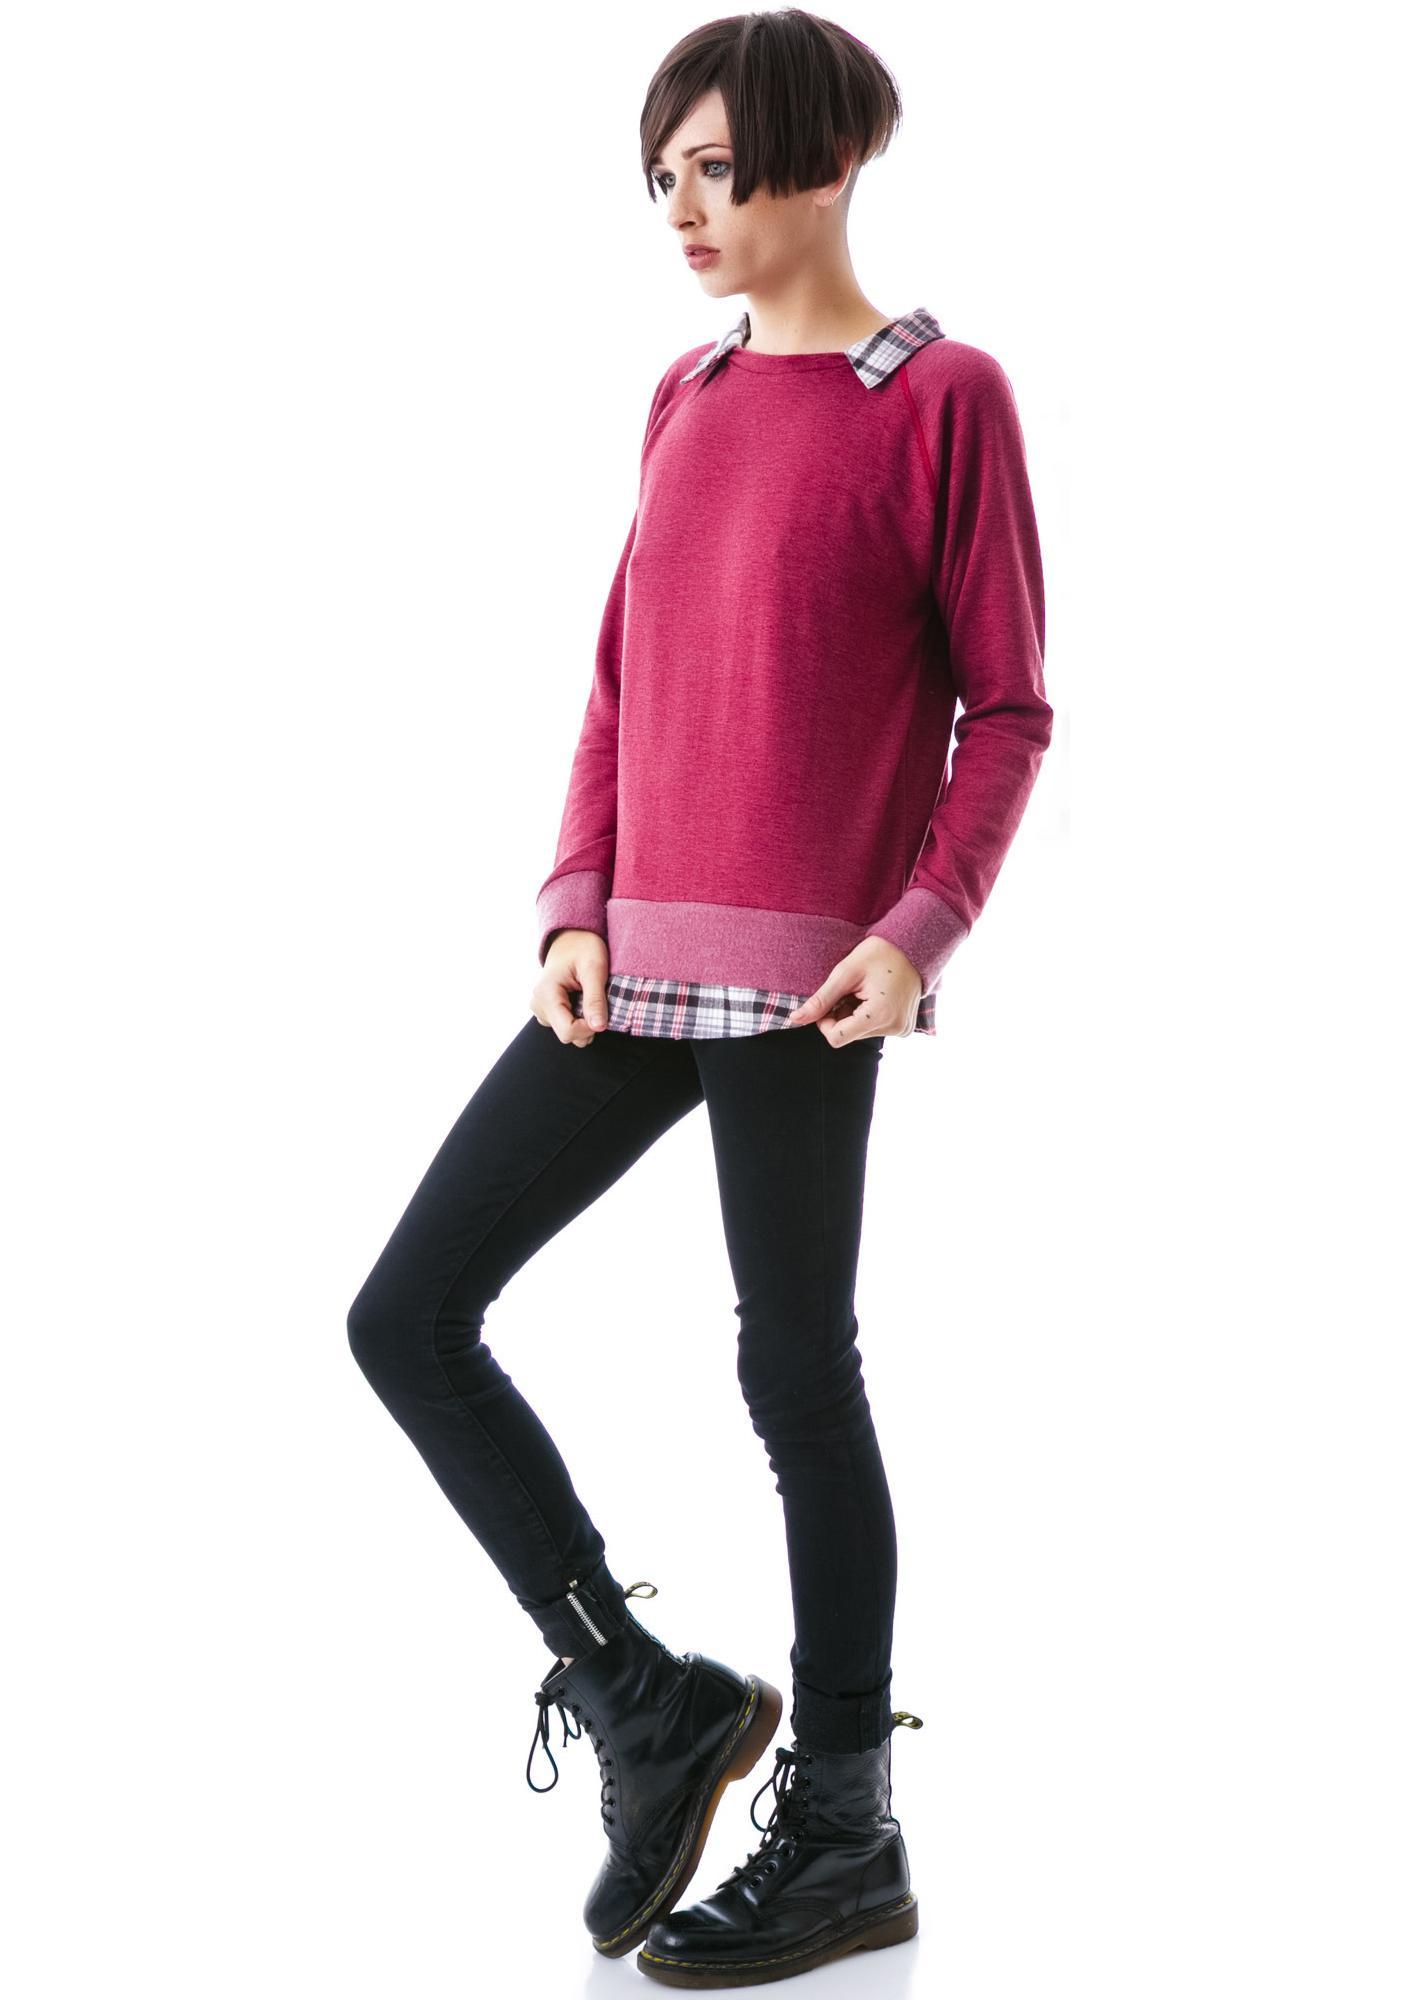 JET by John Eshaya Preppy Collared Sweatshirt